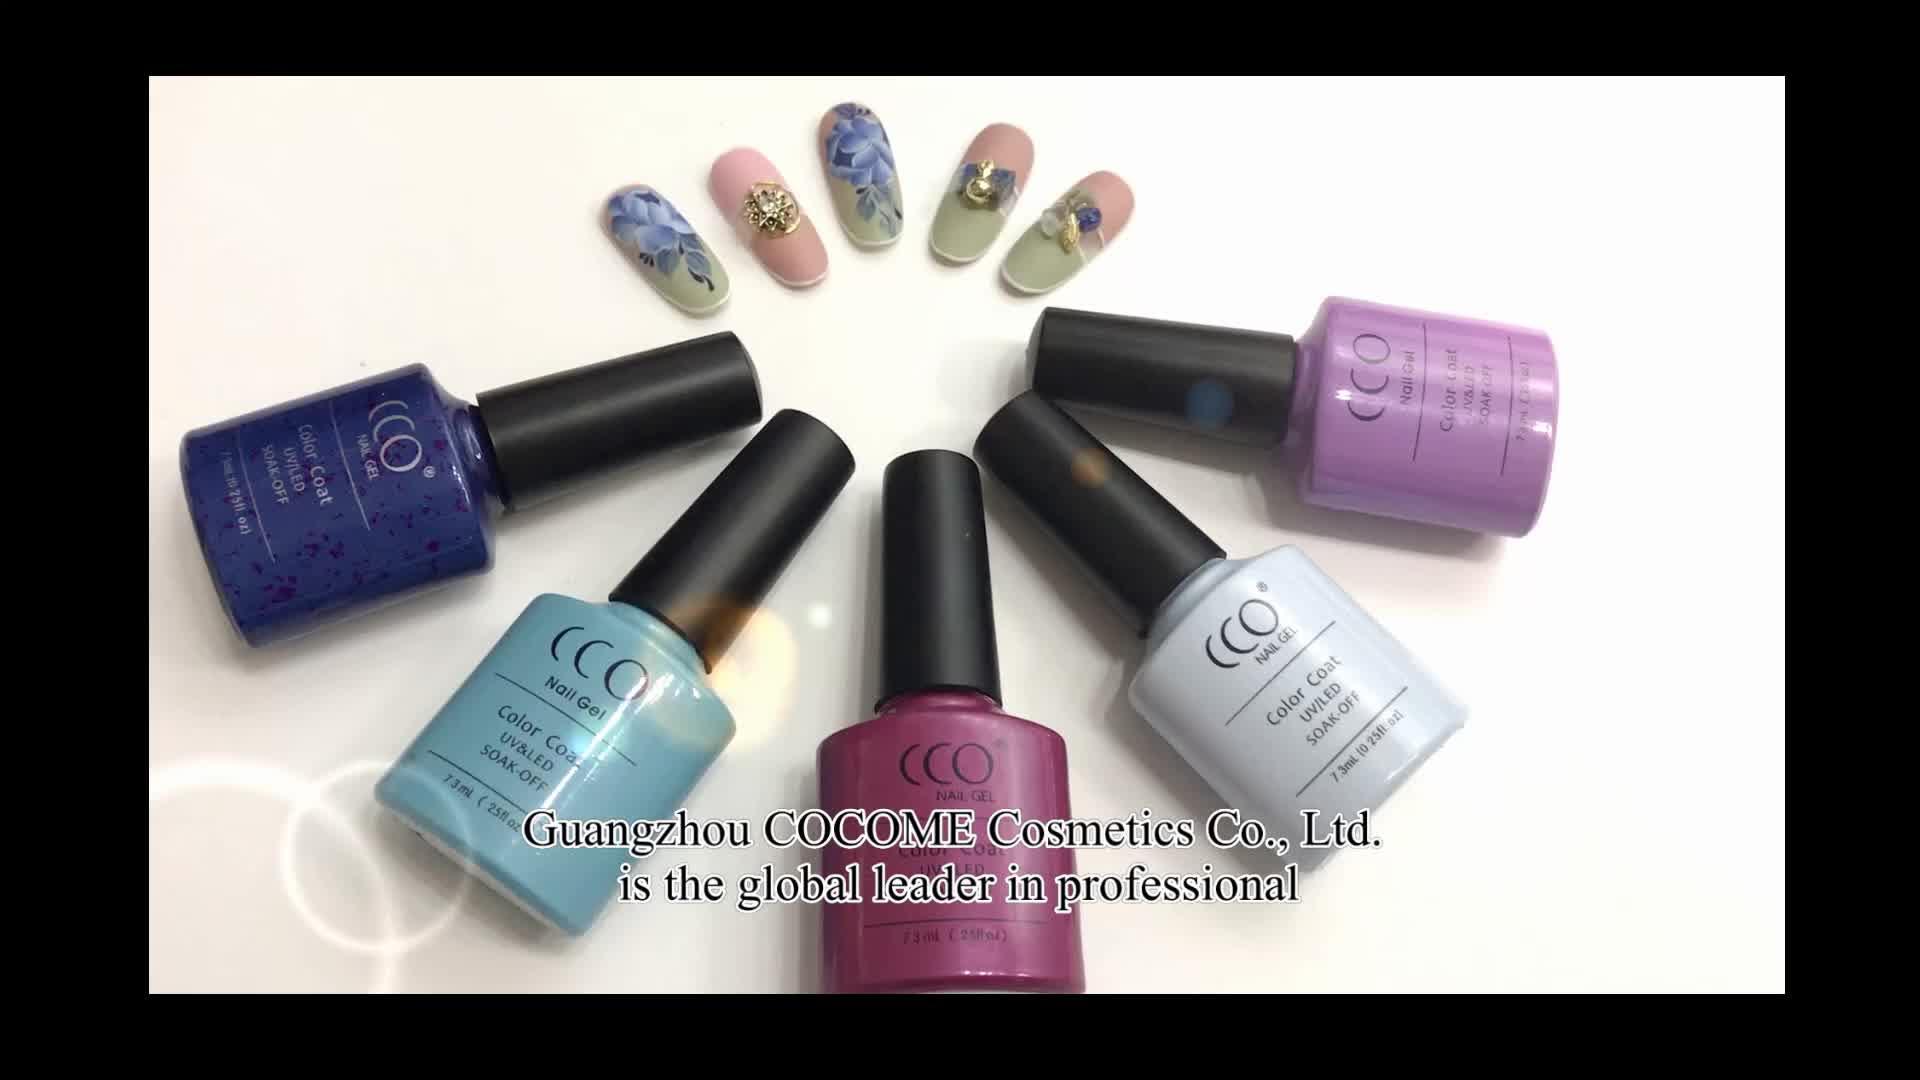 Cco Direct Sale China Gel Nail Polish High Profit Margin Products ...